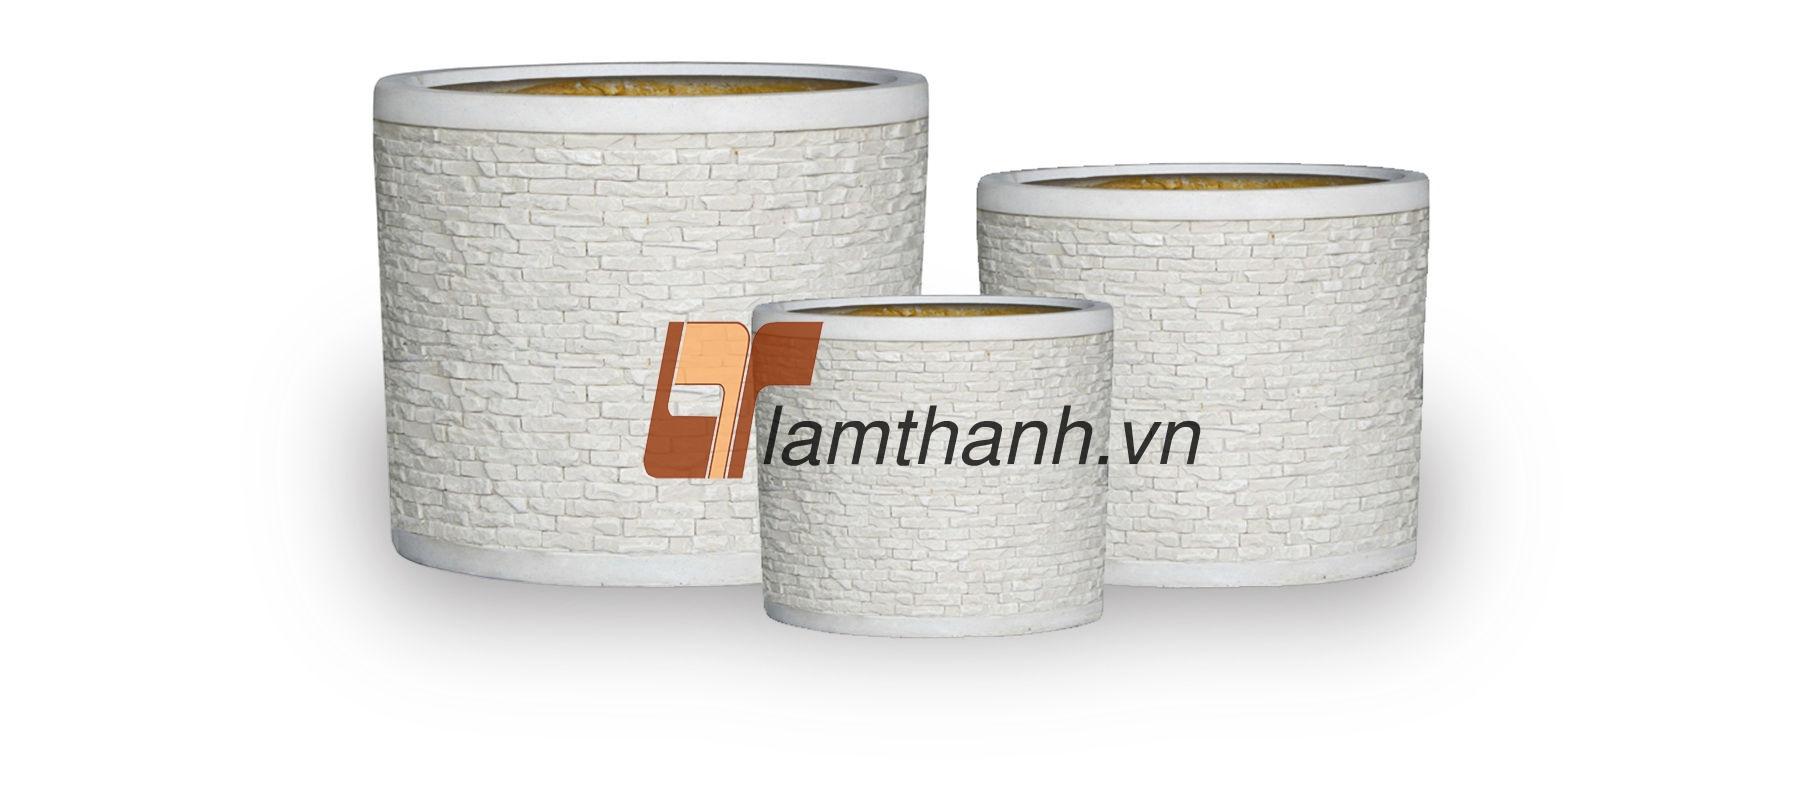 vietnam polystone, outdoor glazed 02